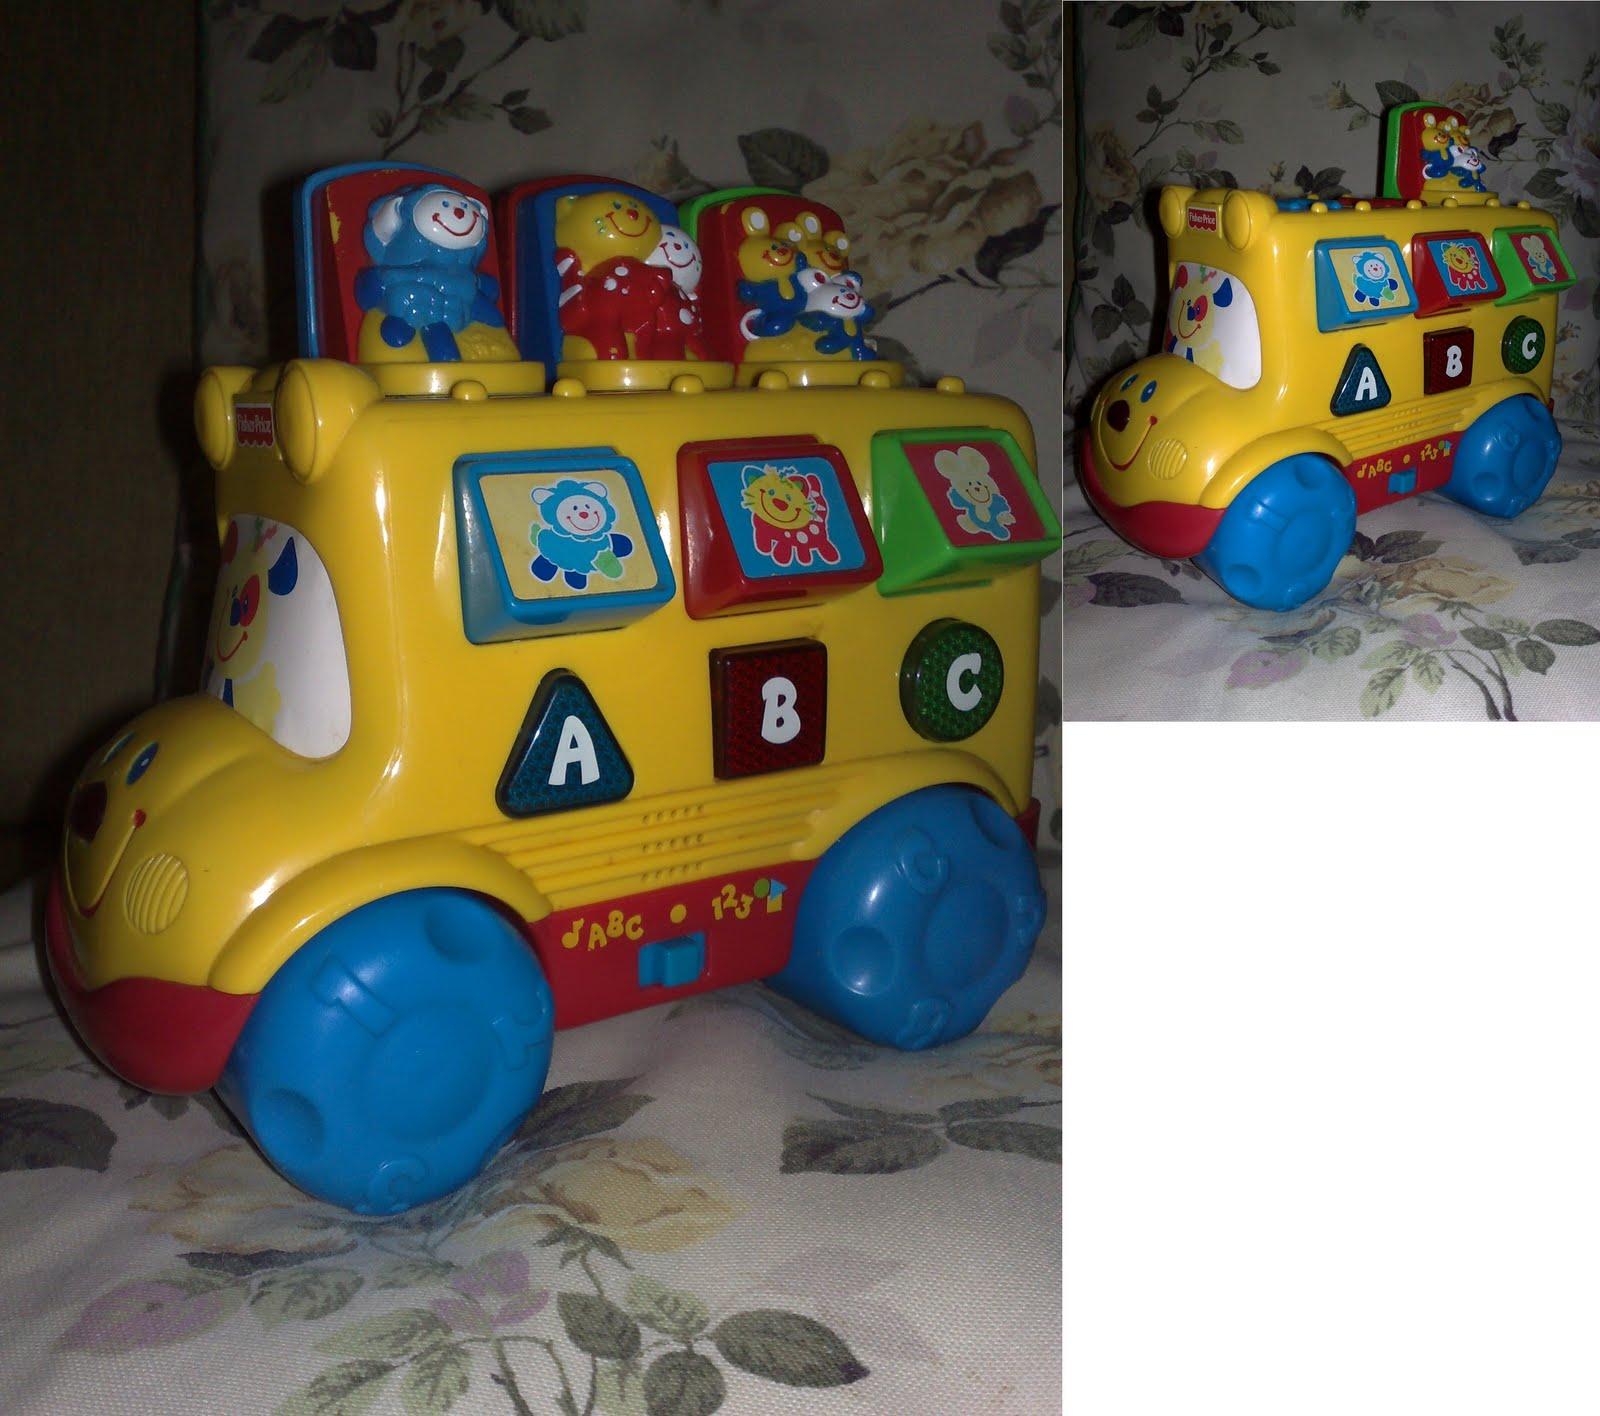 1999 Fisher Price Baby Smartronics Nursery Rhymes School ...  |Fisher Price Bus Nursery Rhymes